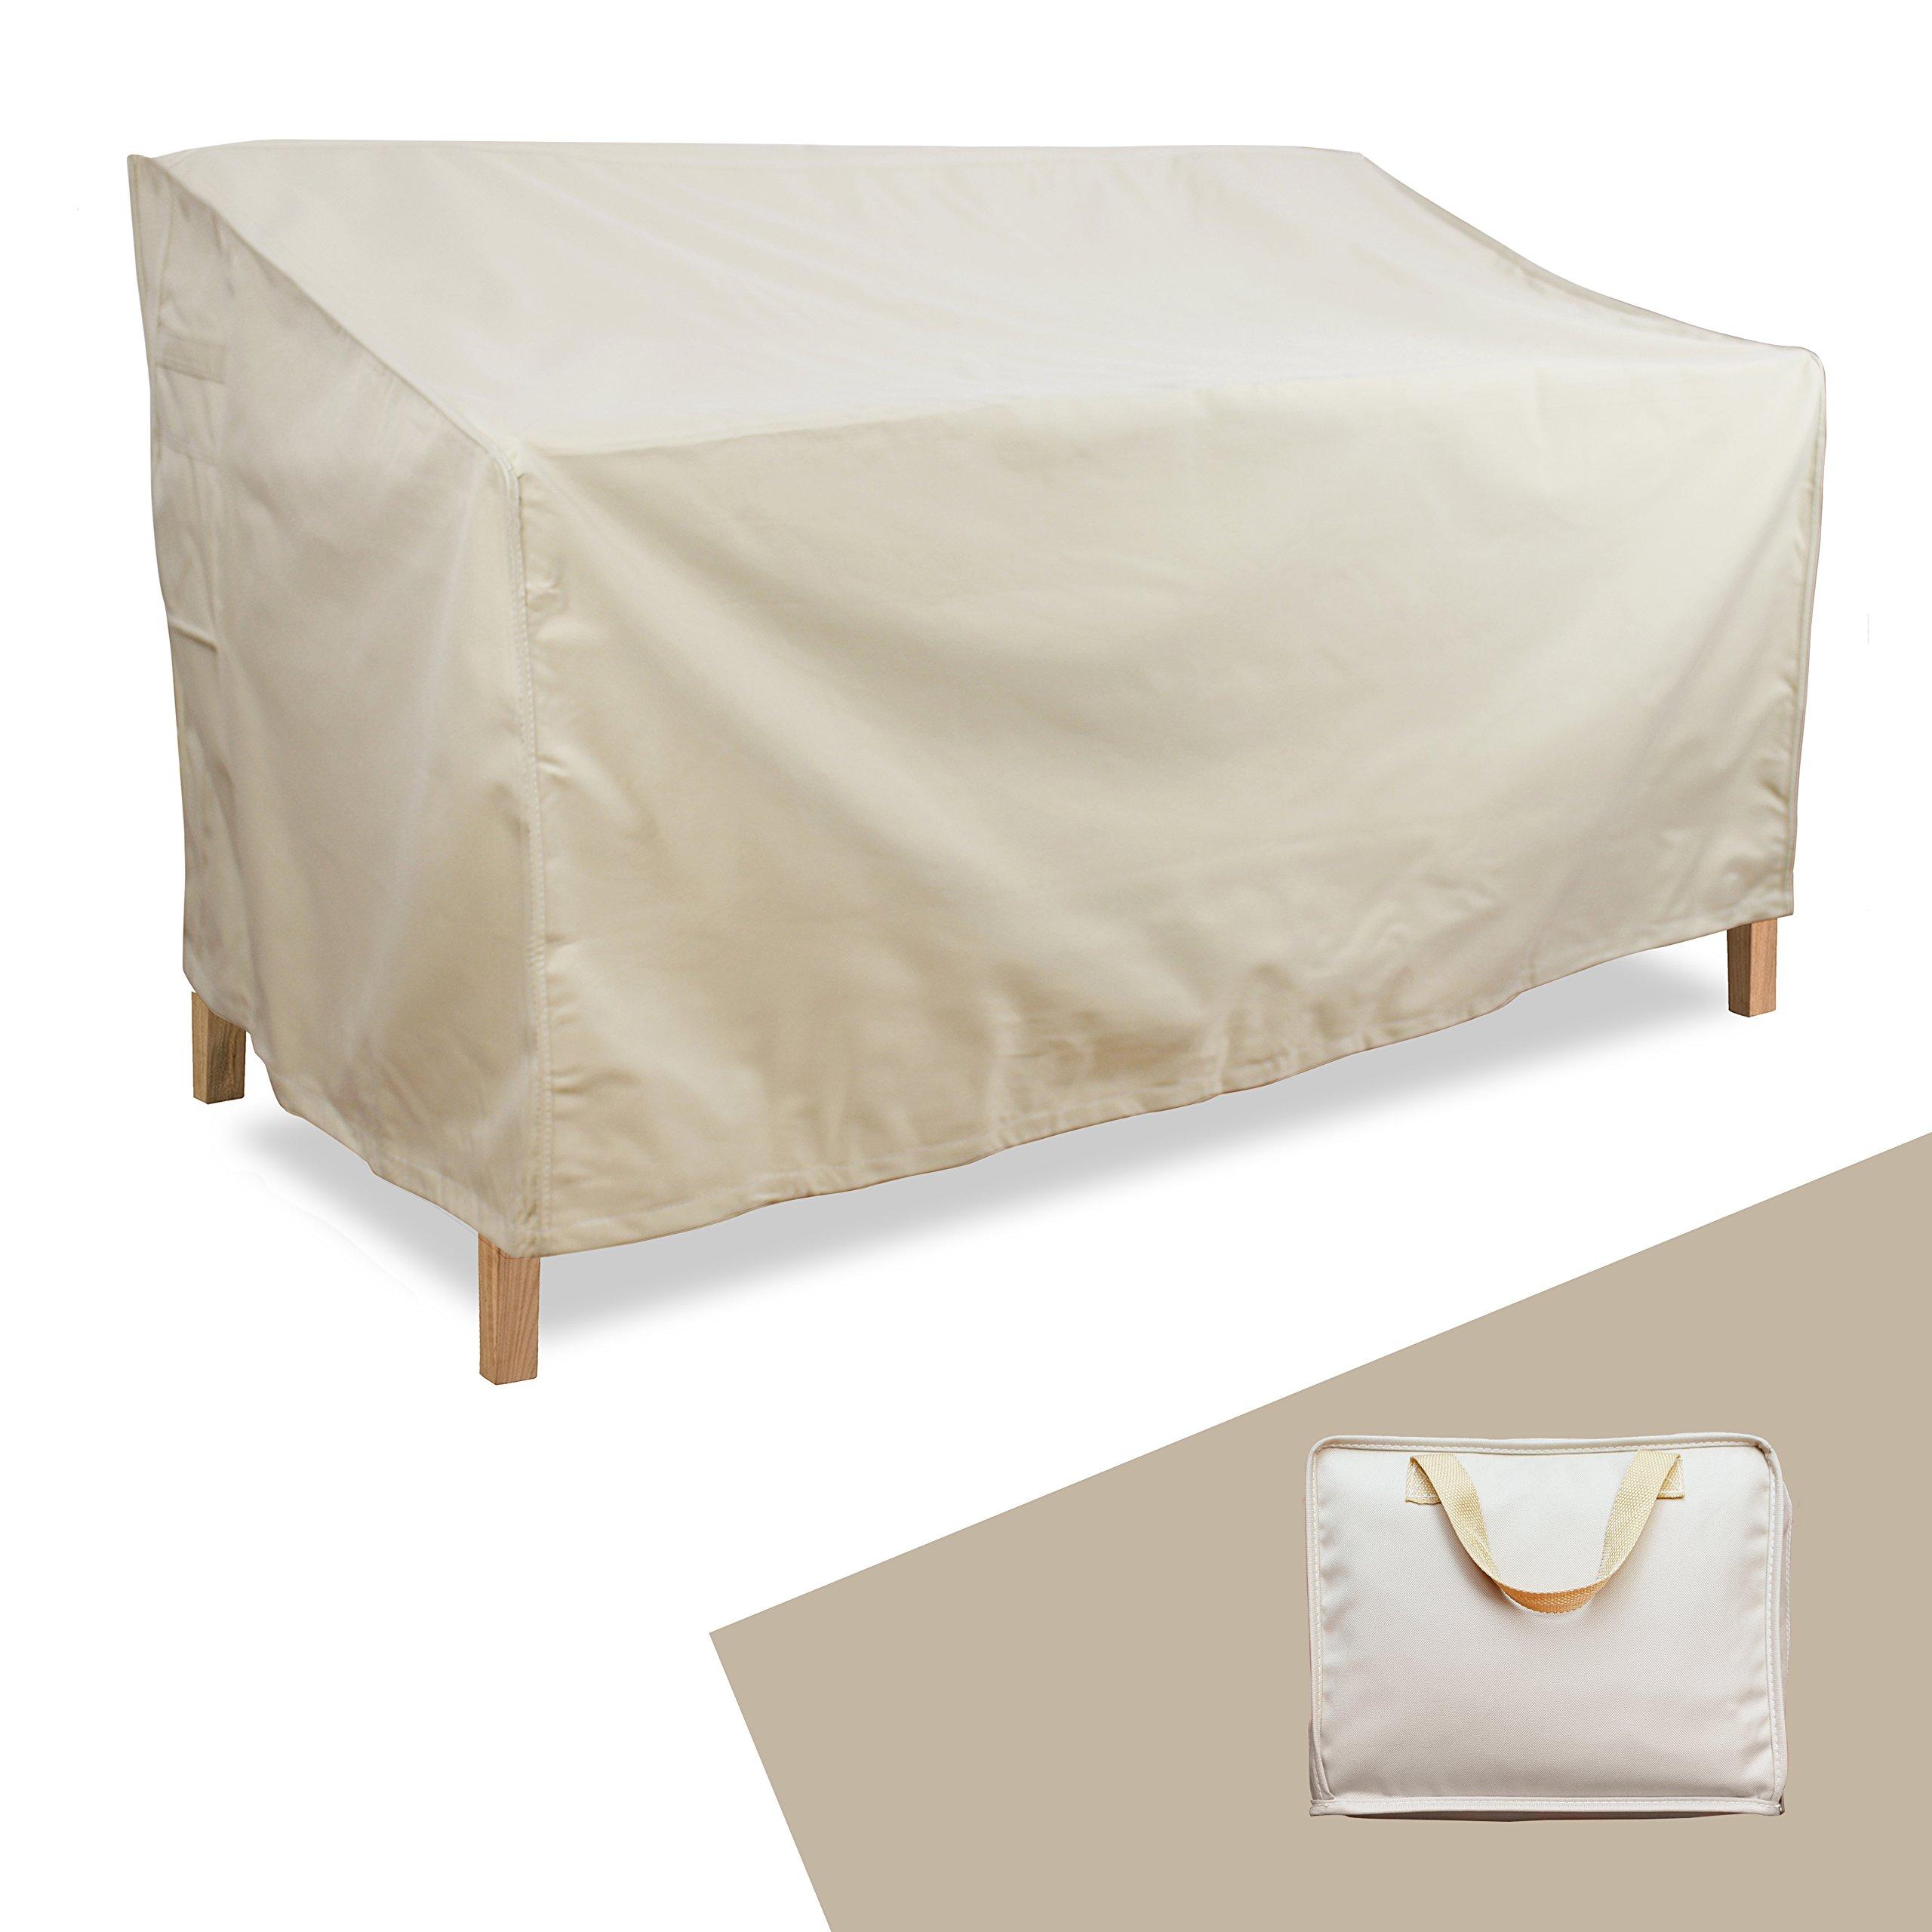 Gardzen Large Heavy-Duty Sofa/Loveseat Cover - Heavy Duty,Garden Furniture Cover, Out-Door Furniture Cover (88''(L) x 33'' (D) x 33'' (H), Khaki)